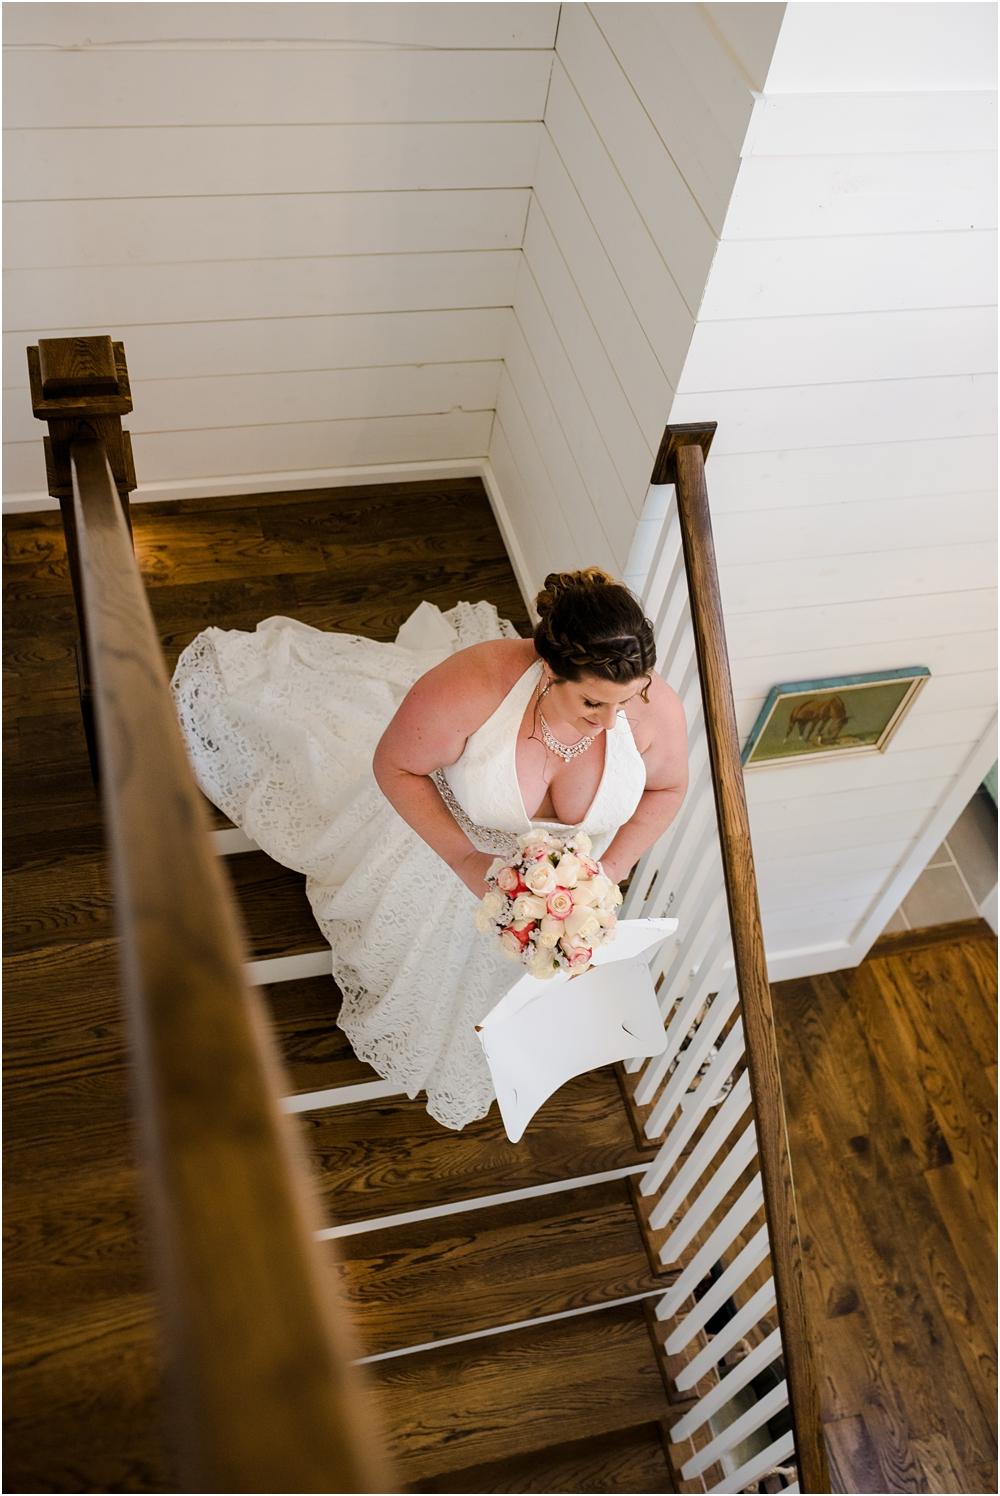 mosley-wedding-kiersten-stevenson-photography-30a-panama-city-beach-dothan-tallahassee-(81-of-472).JPG